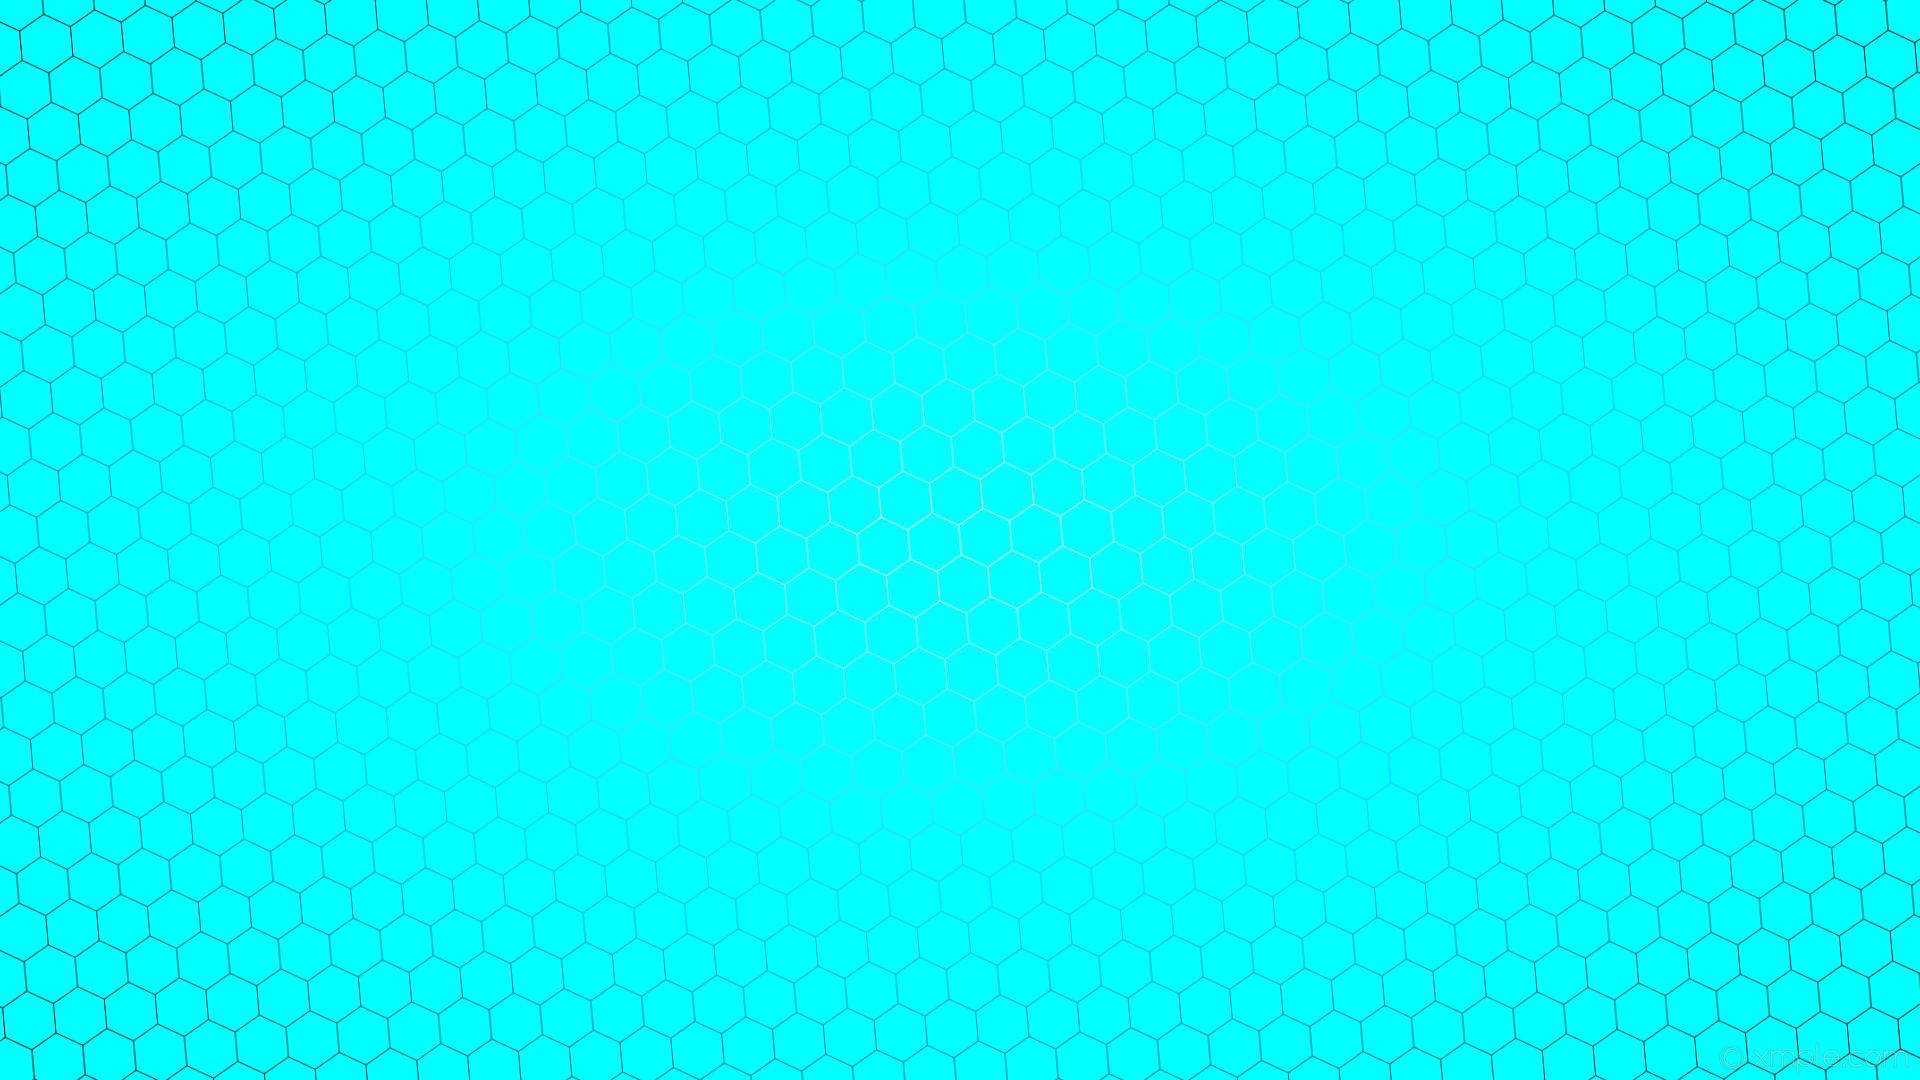 Res: 1920x1080, wallpaper glow hexagon black white blue gradient aqua cyan deep sky blue  #00ffff #ffffff